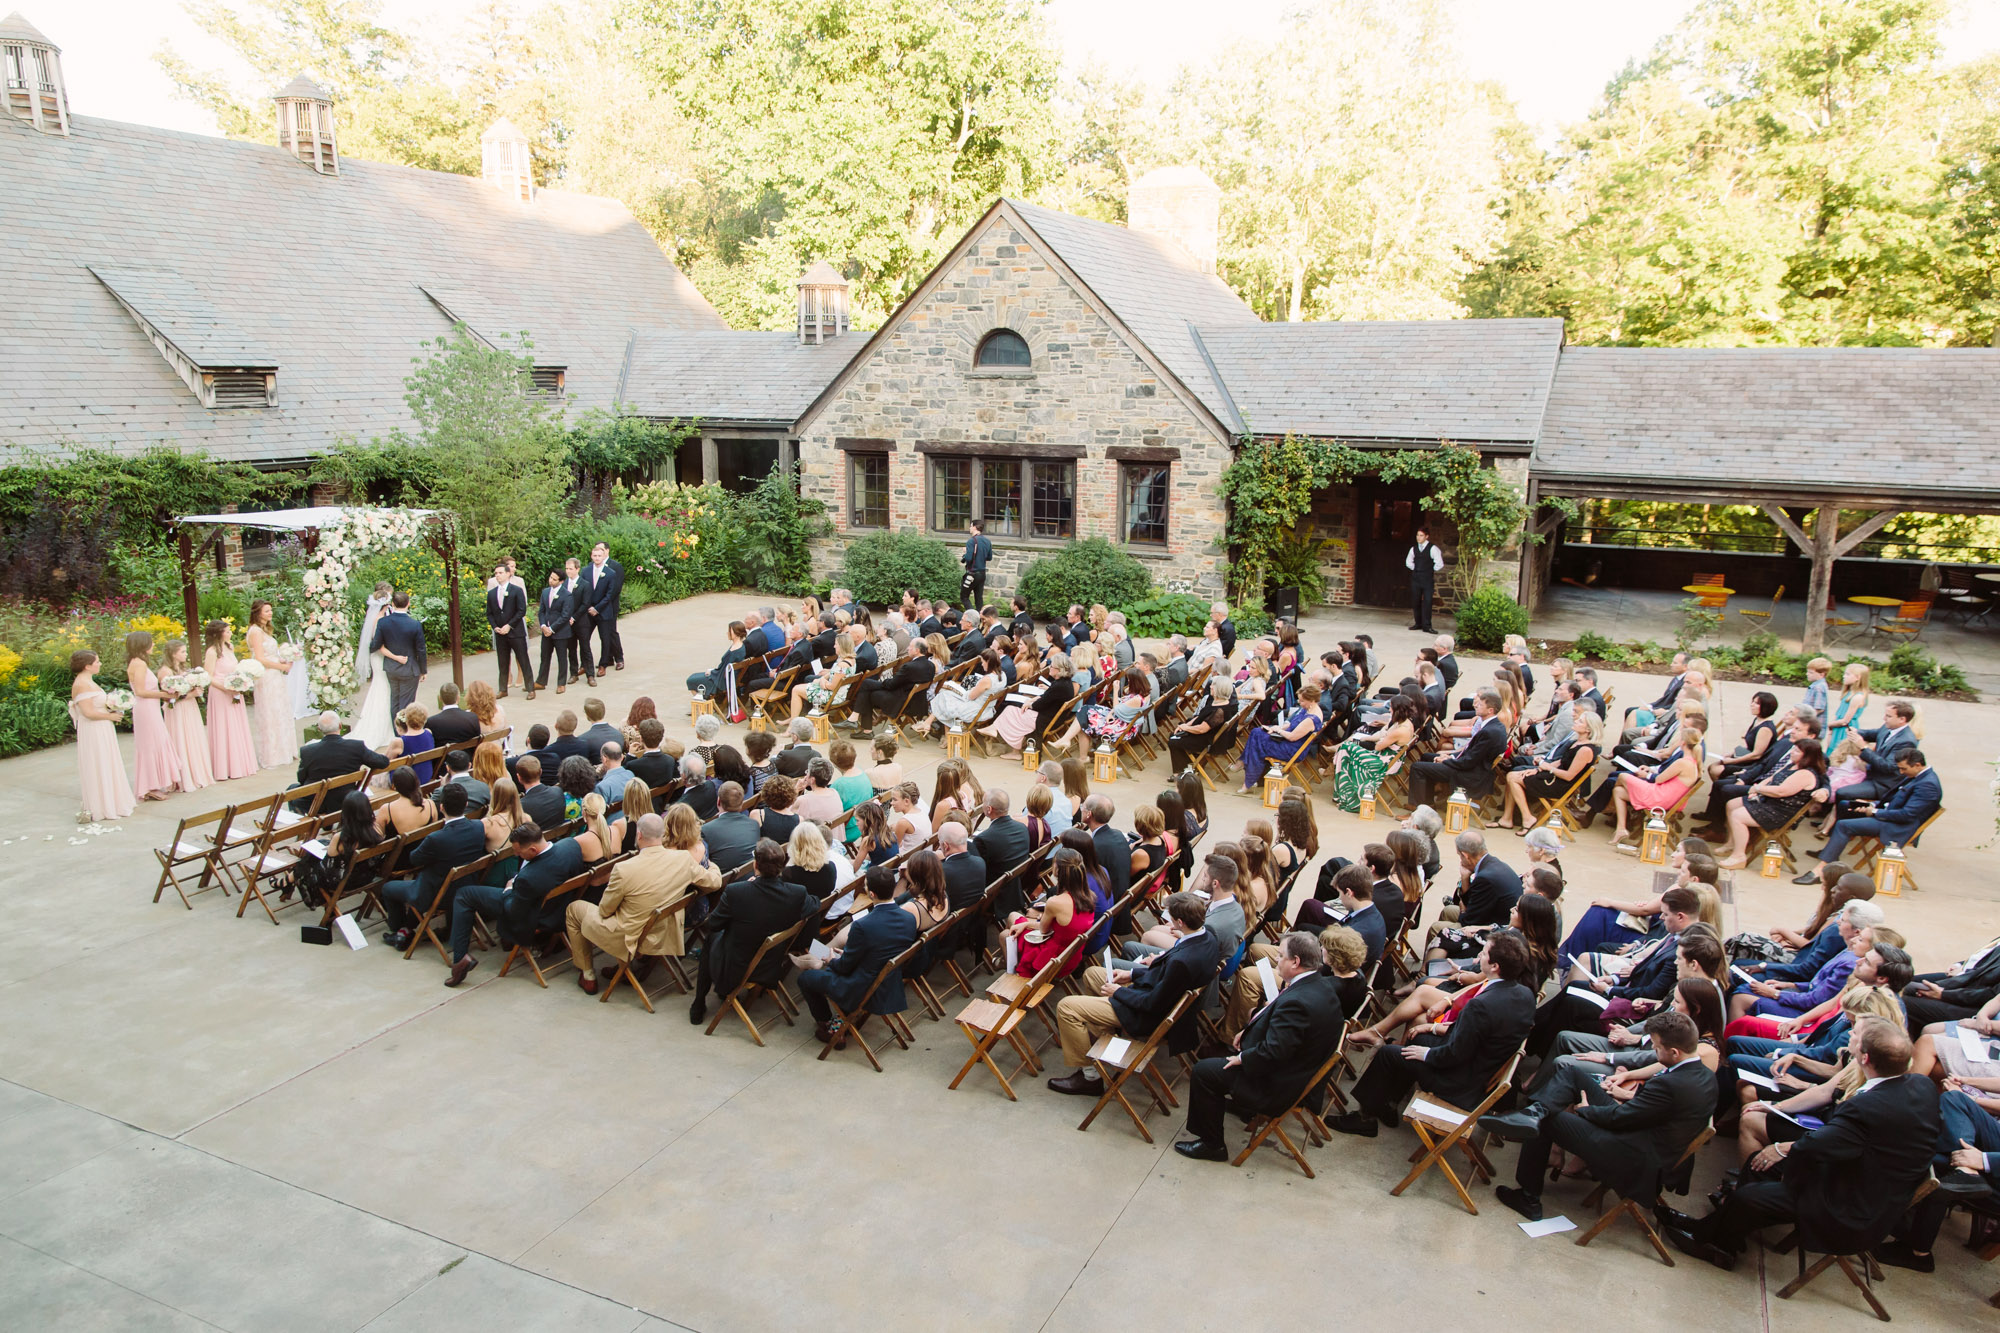 46_Jessica_Ted_Blue_Hill_Stone_Barns_Wedding_Pocantico_NY_Tanya_Salazar_Photography_130.jpg